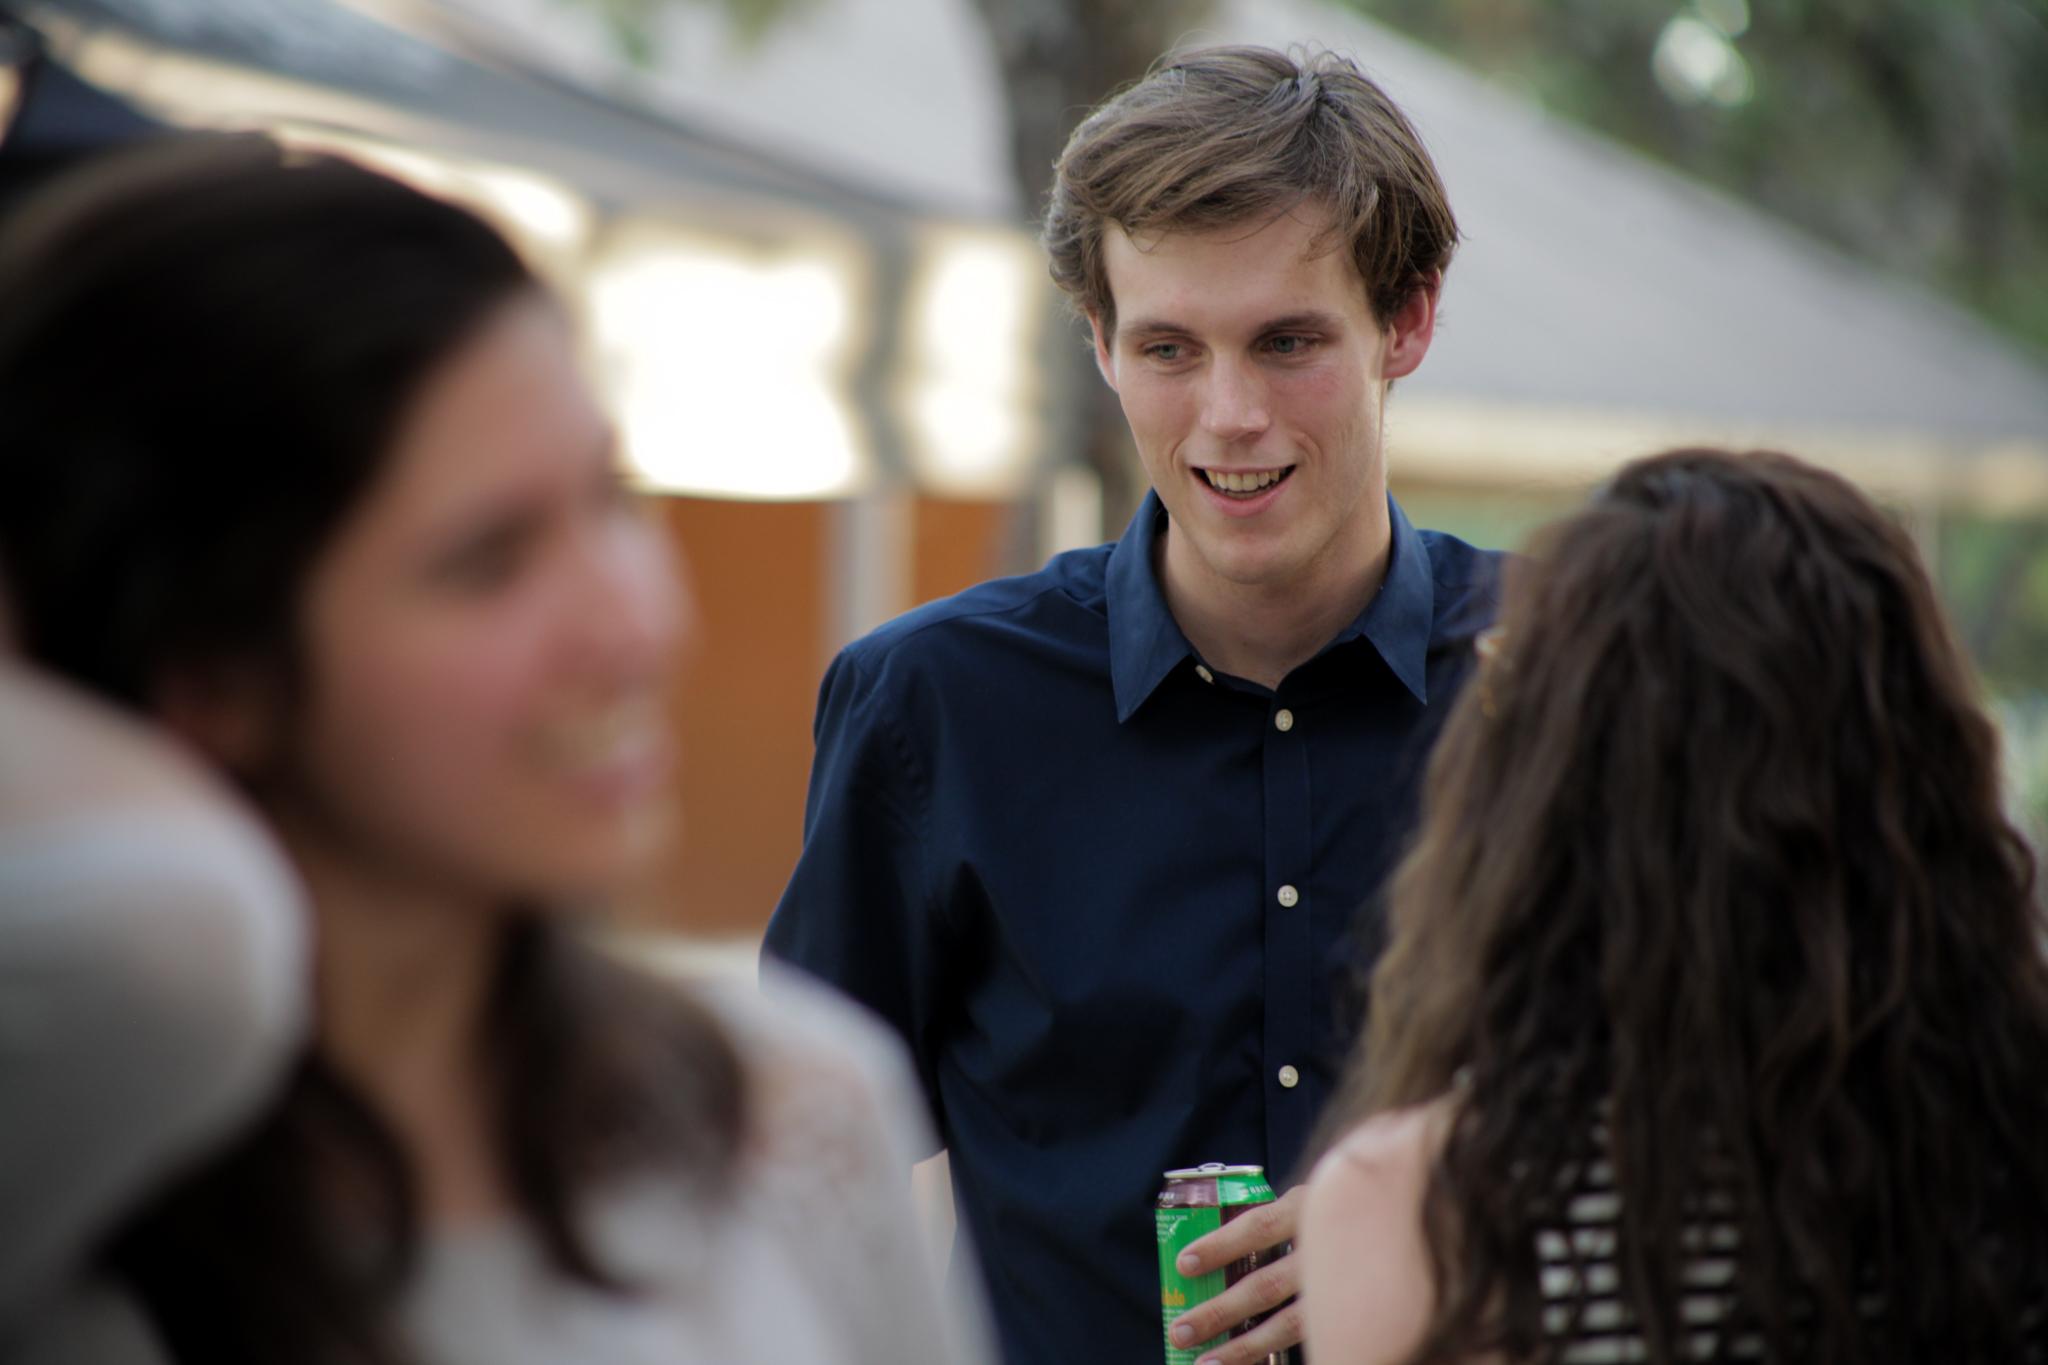 Artist Cade Bradshaw socializes before speaking at PechaKucha.